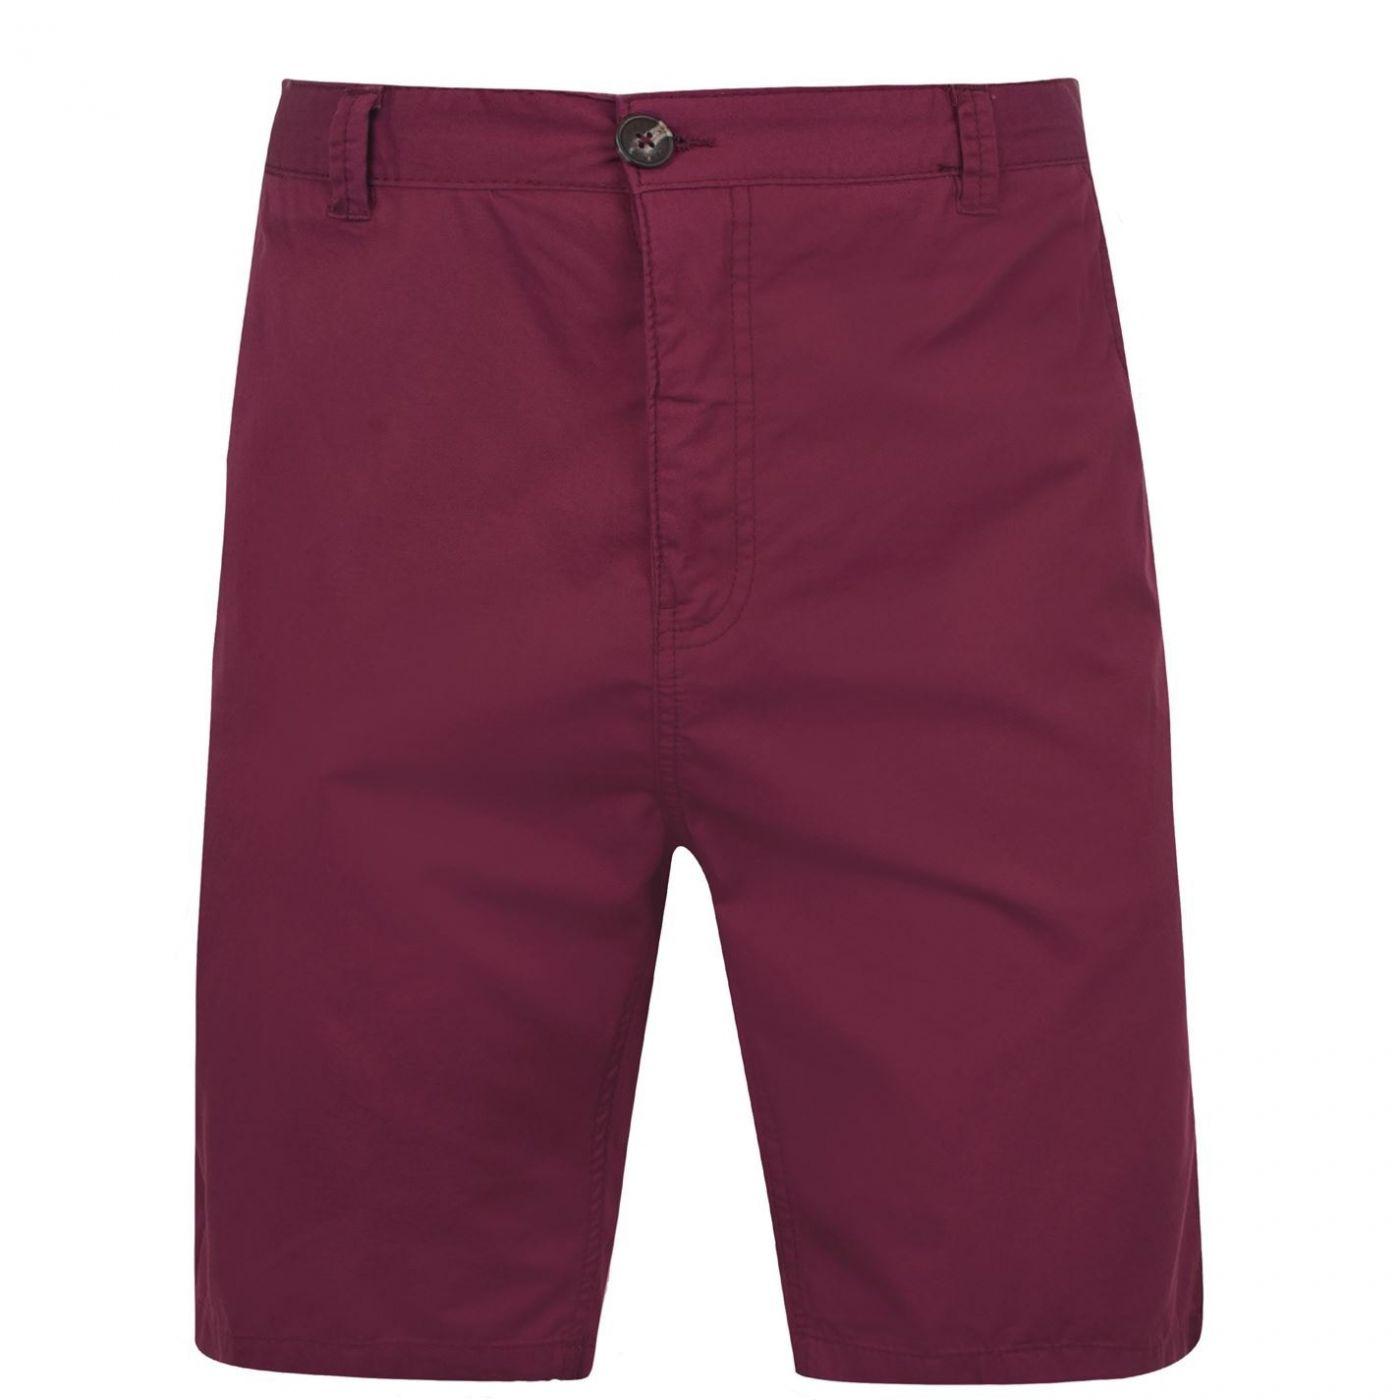 Men's shorts Pierre Cardin Washed Chino